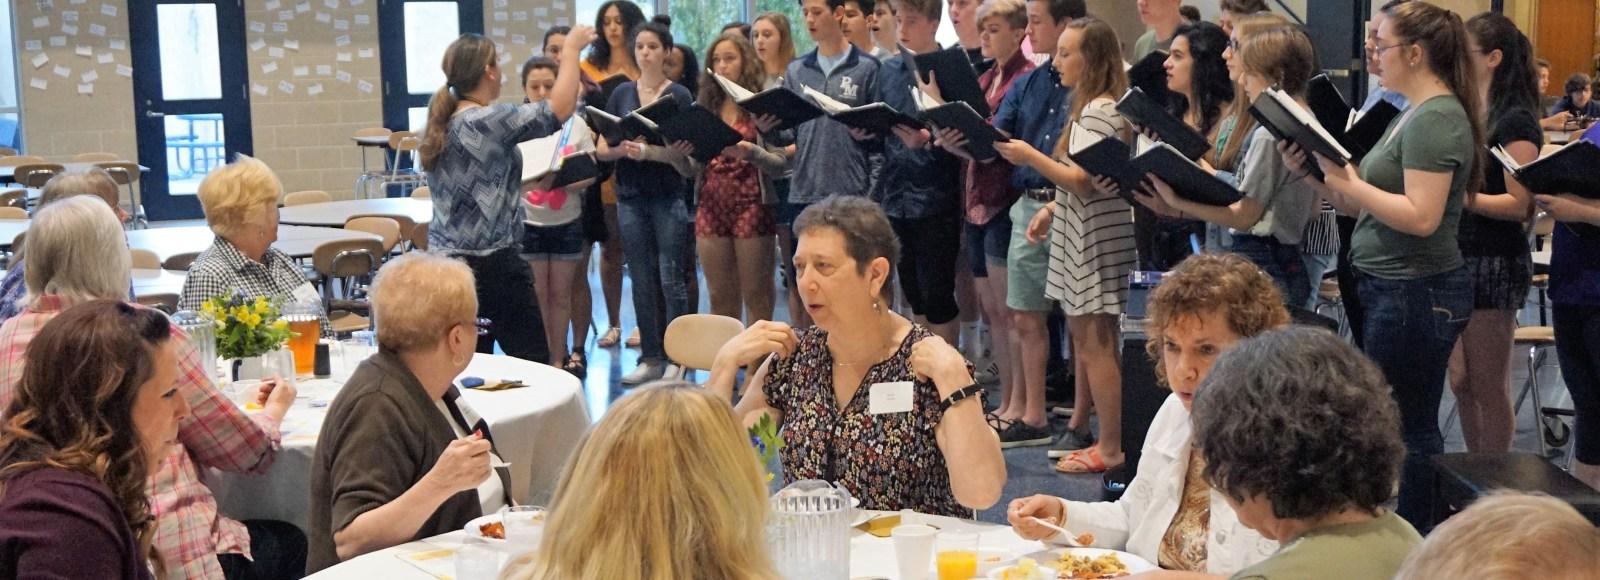 Penn Manor retirees enjoy 13th annual breakfast